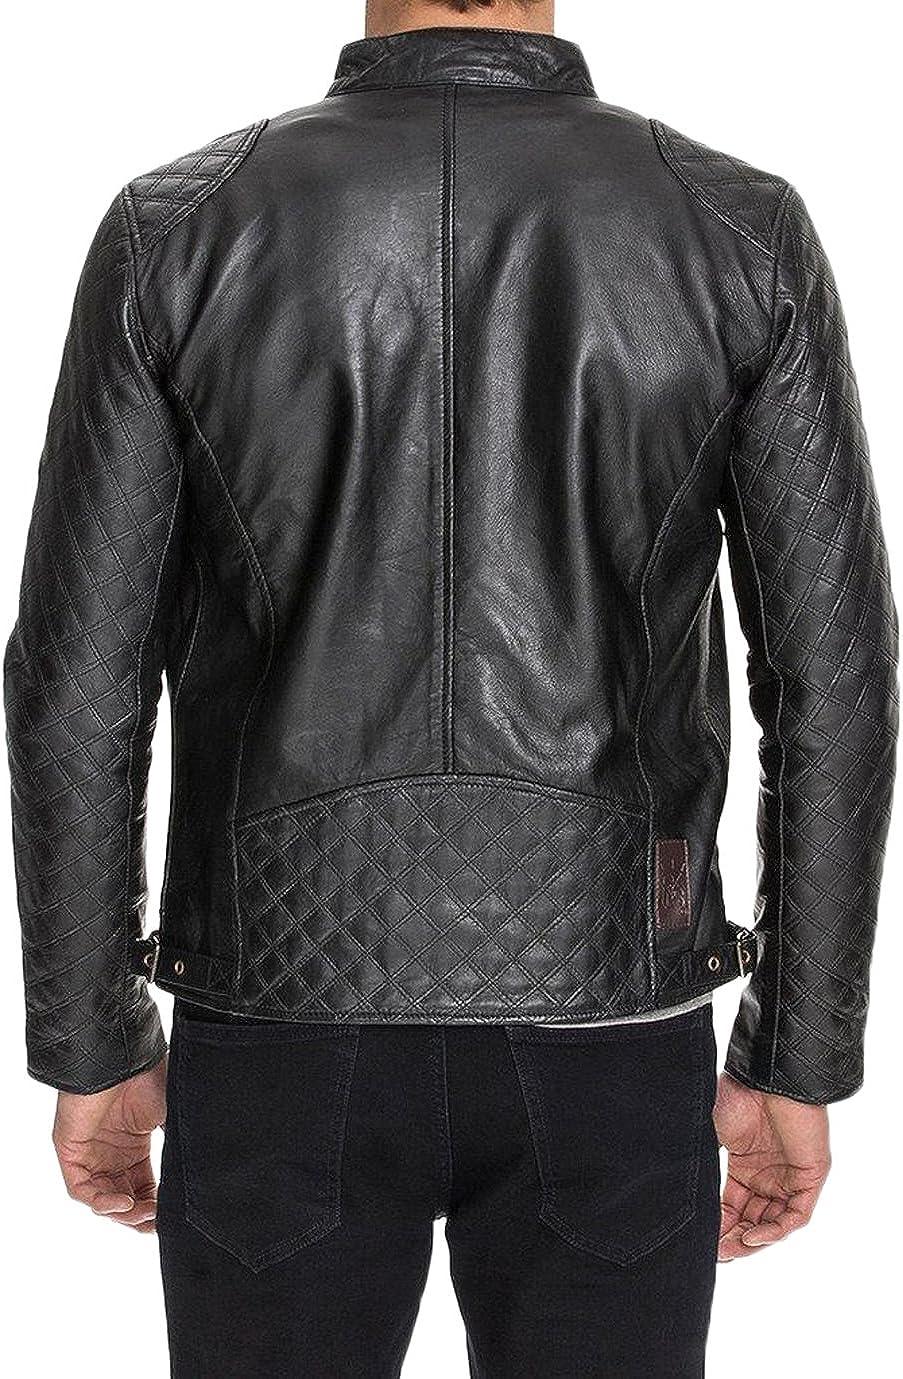 Kingdom Leather Men Leather Jacket New Soft Lambskin Slim Biker Bomber Coat X1359